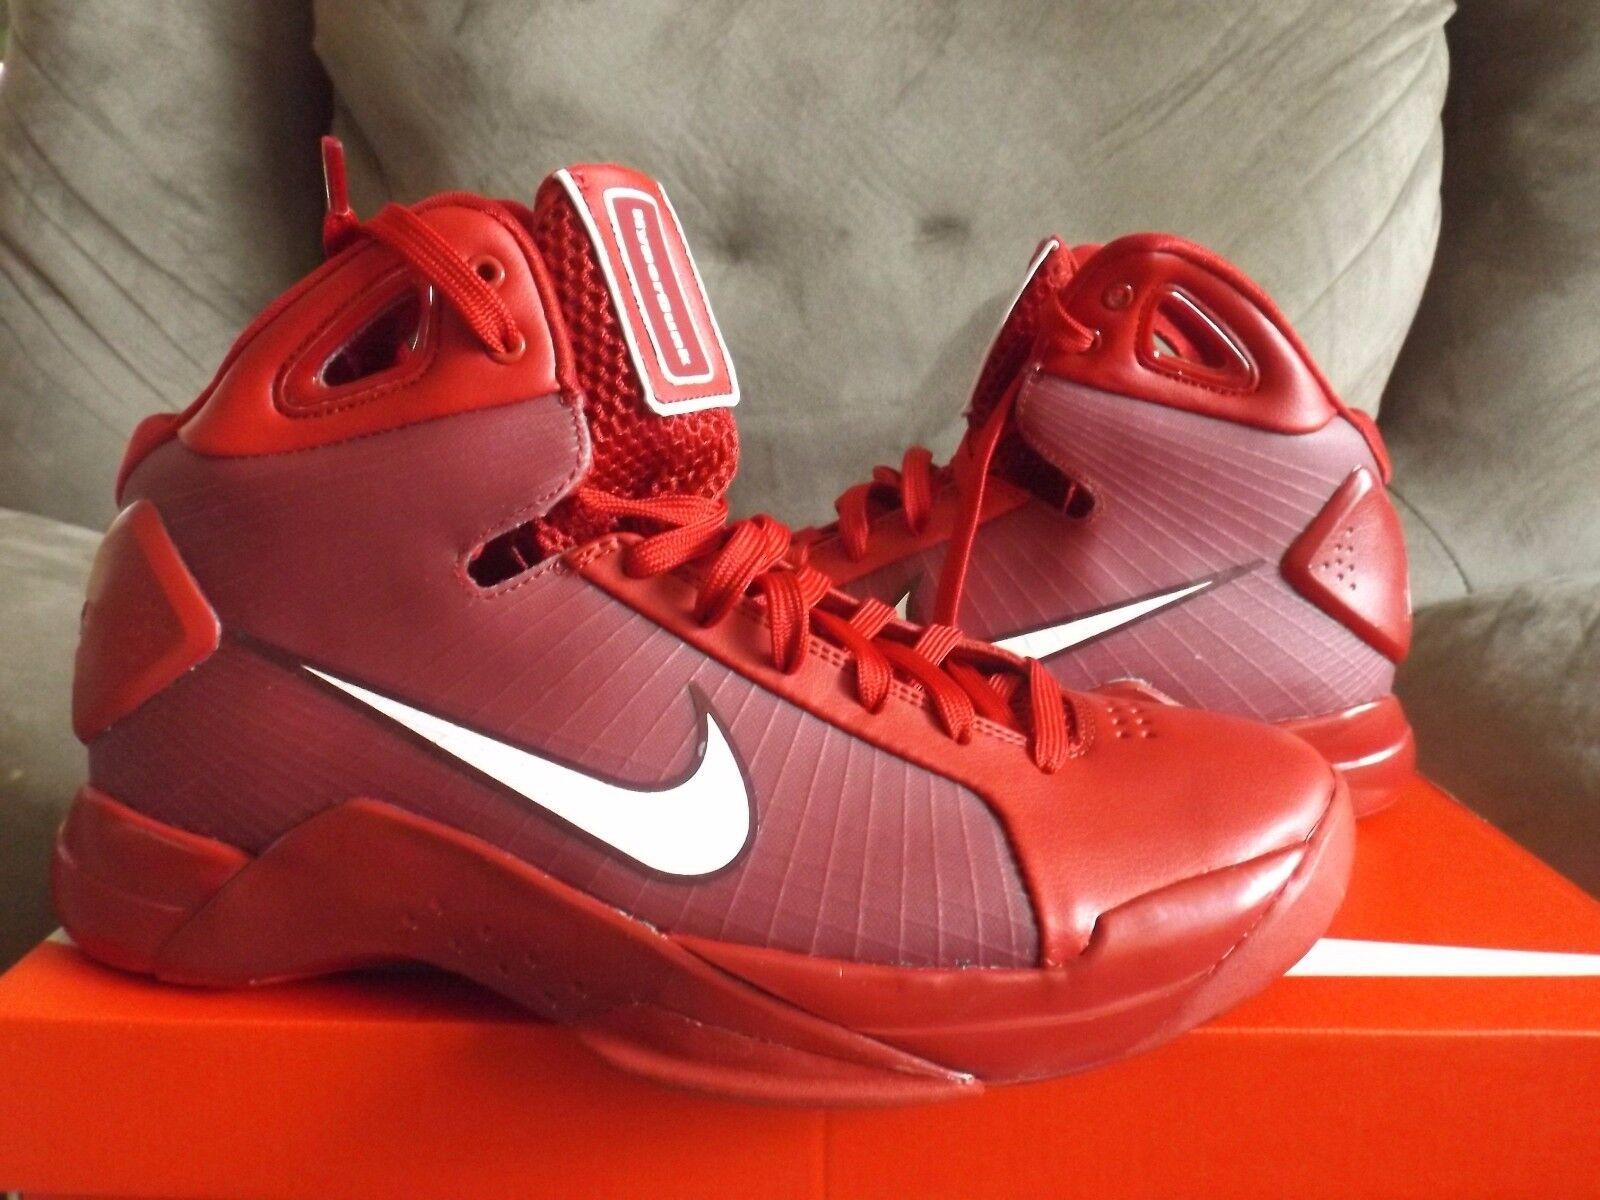 Nike hyperdunk hyperdunk Nike 2008 red uomini scarpe da basket rosso 820321 601 di nuovo senza scatola 216d5d